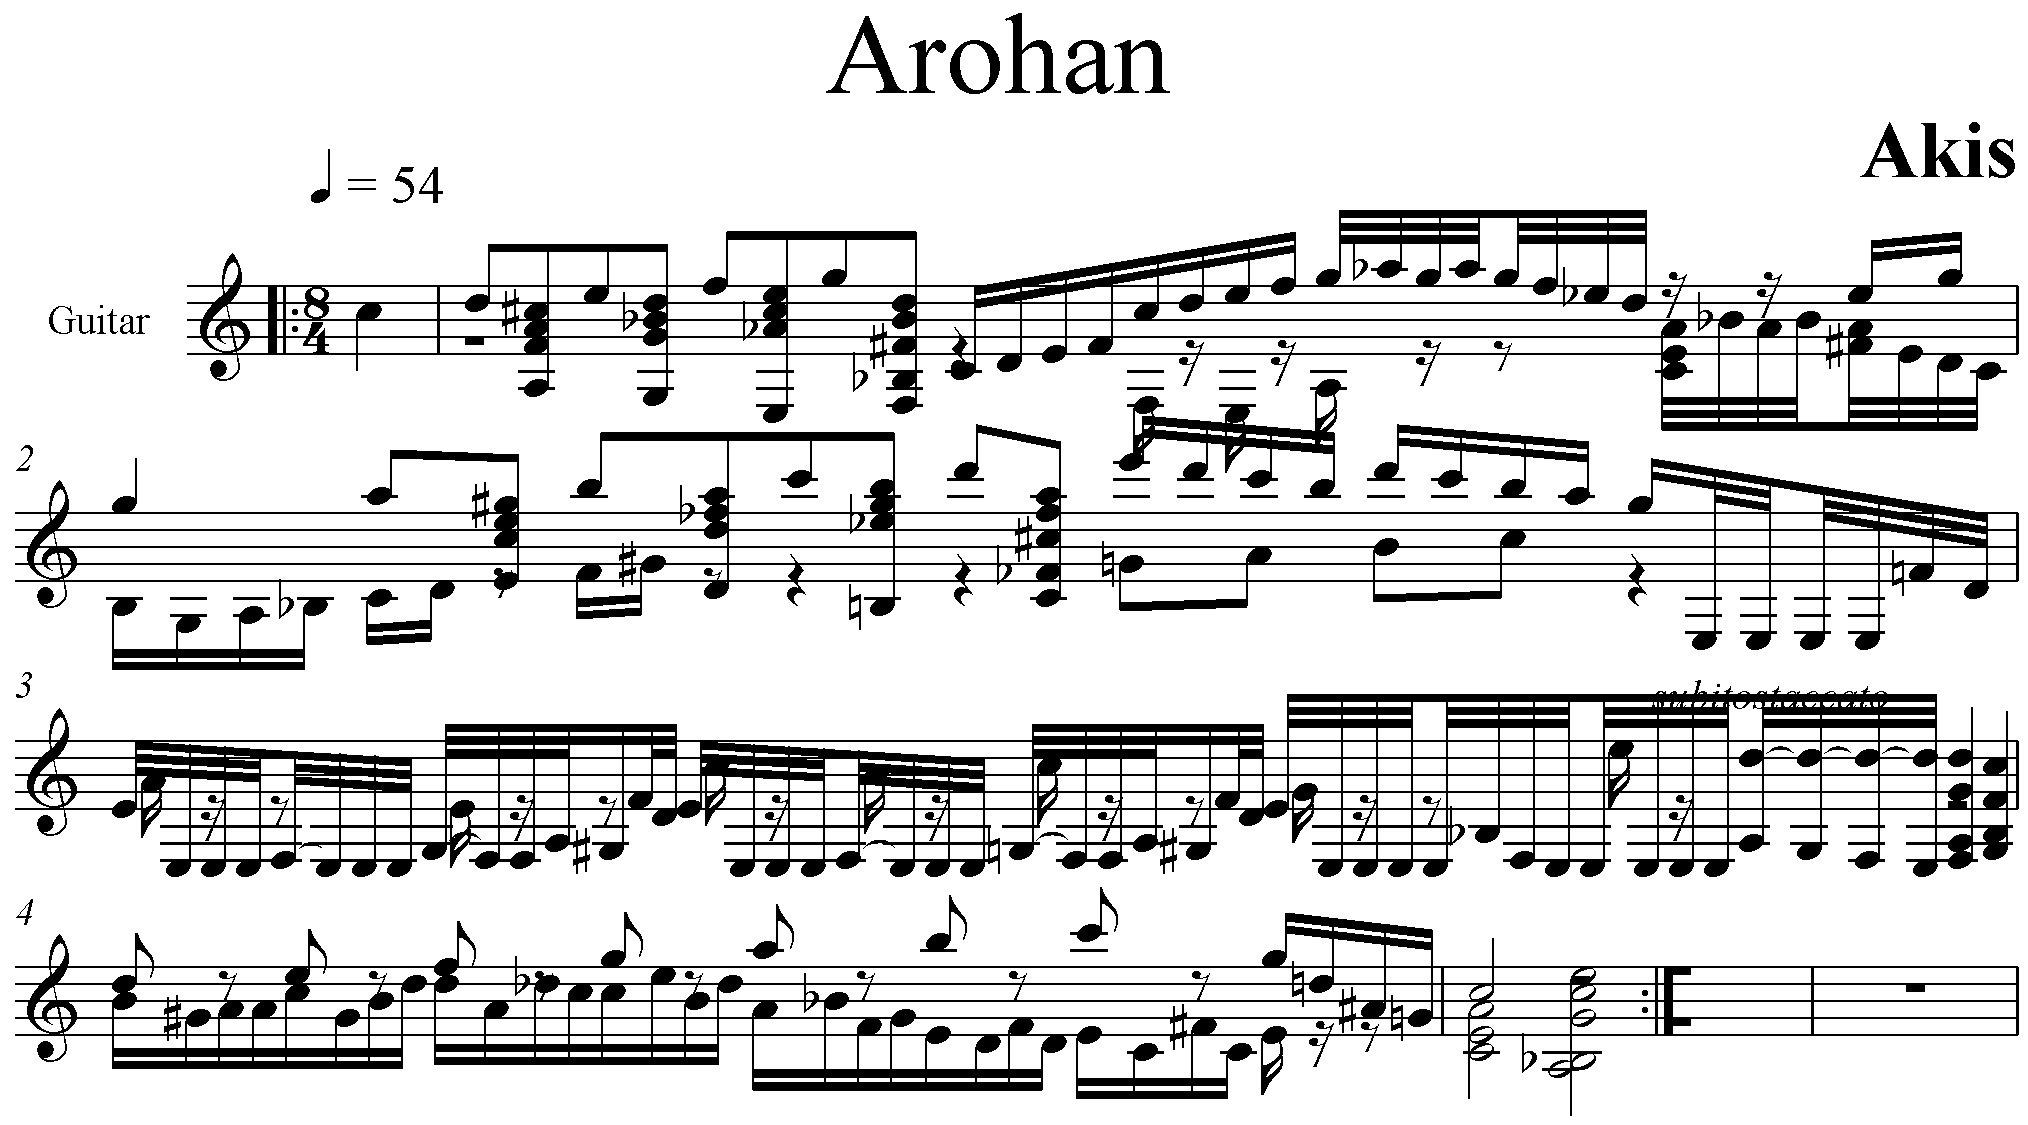 Arohan